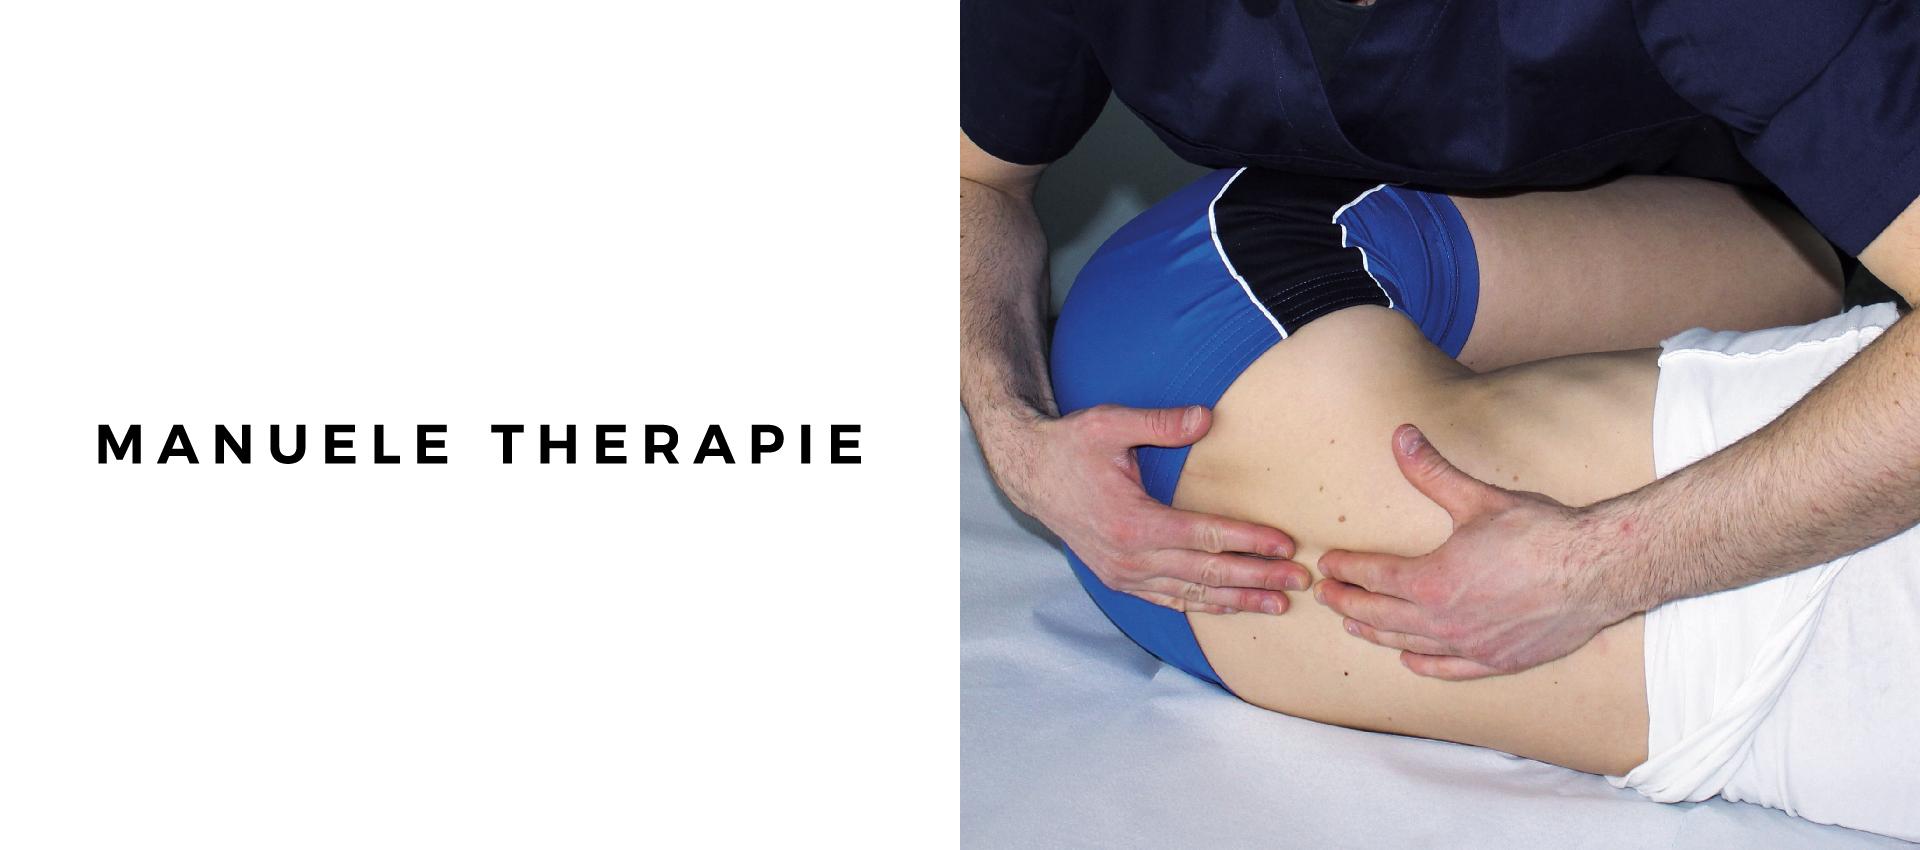 「manuele therapie」の画像検索結果